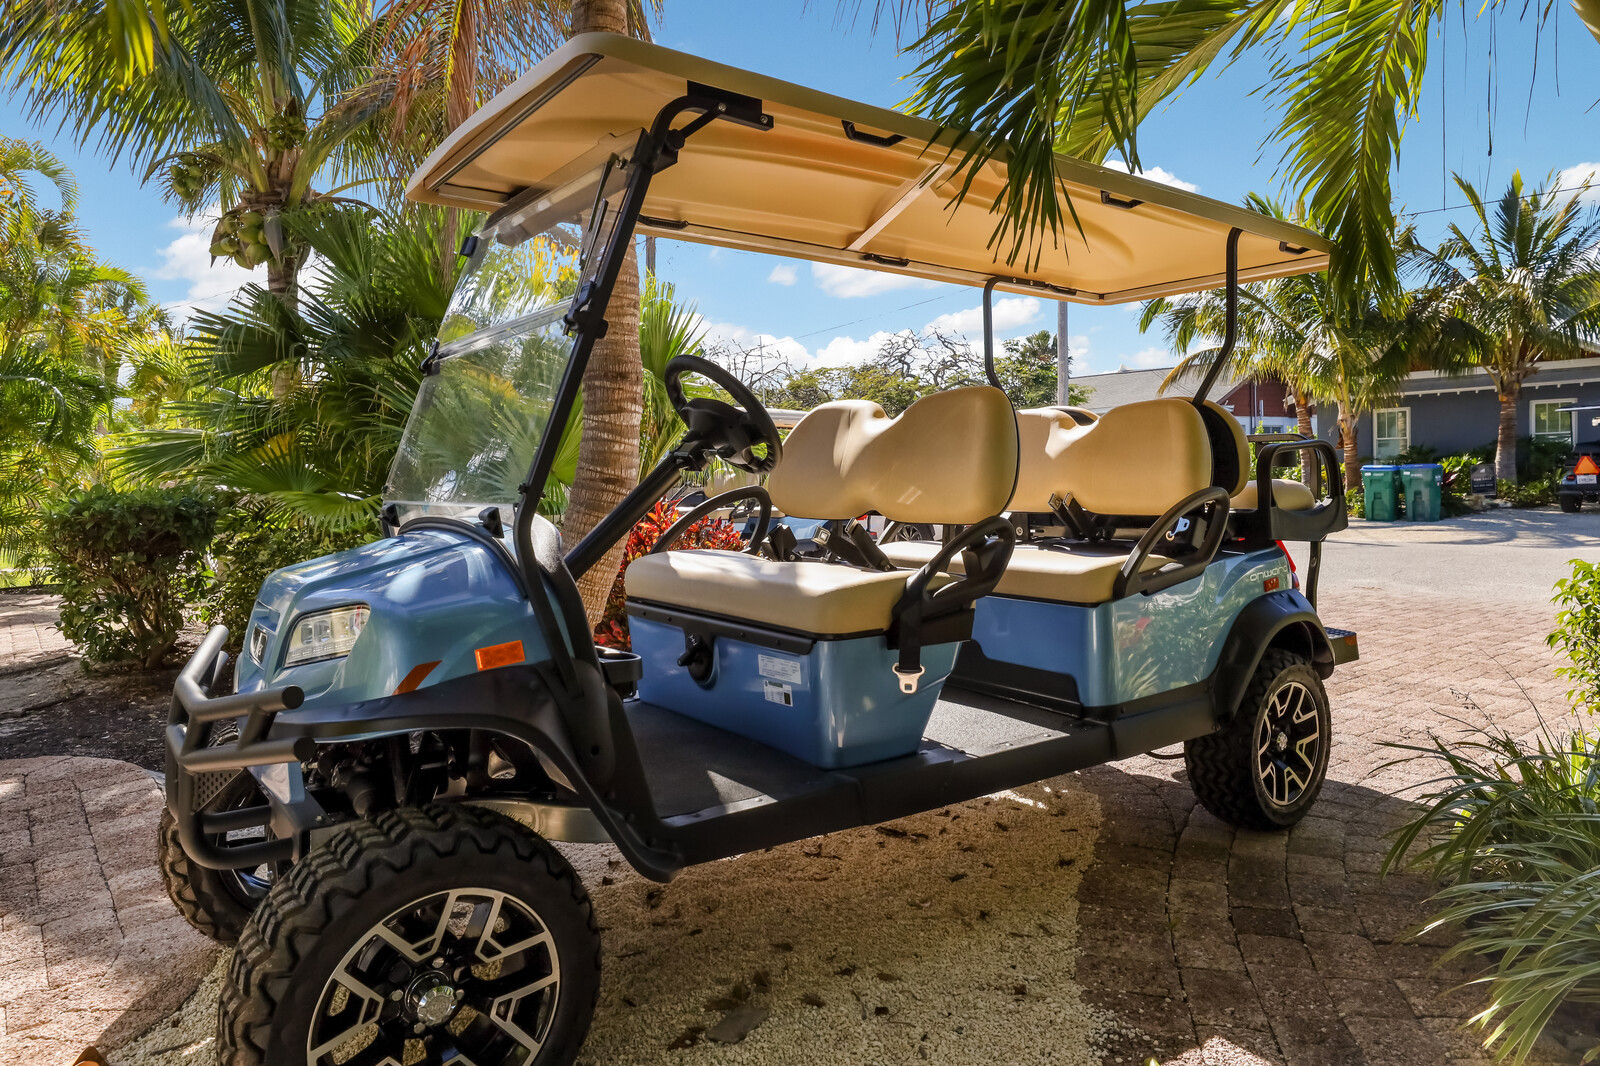 Gas powered golf cart for 6